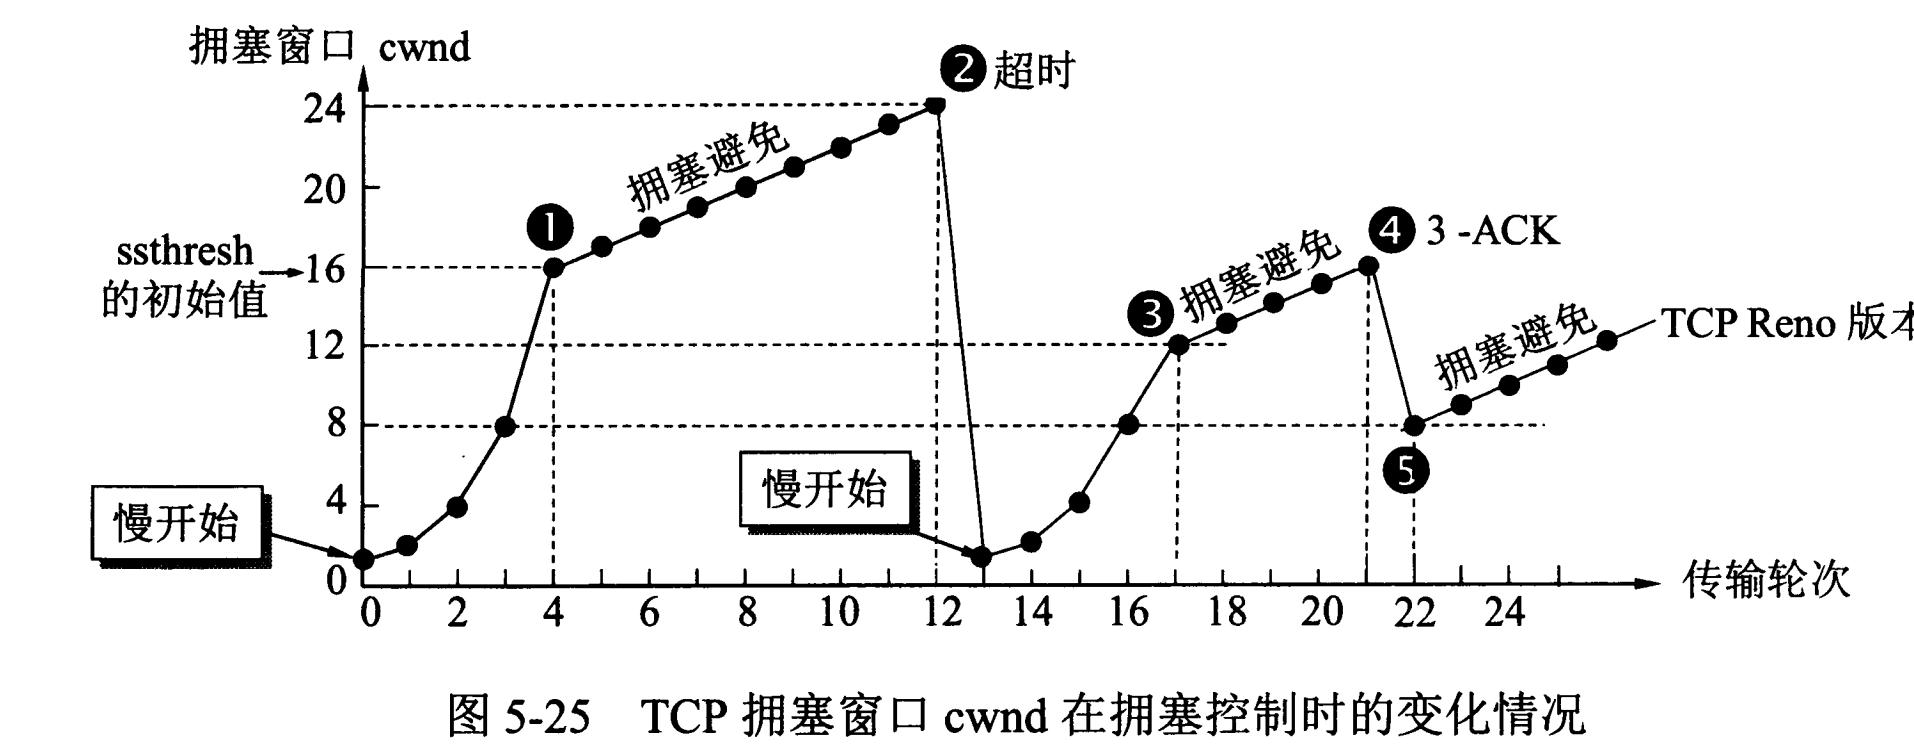 https://cs-notes-1256109796.cos.ap-guangzhou.myqcloud.com/910f613f-514f-4534-87dd-9b4699d59d31.png